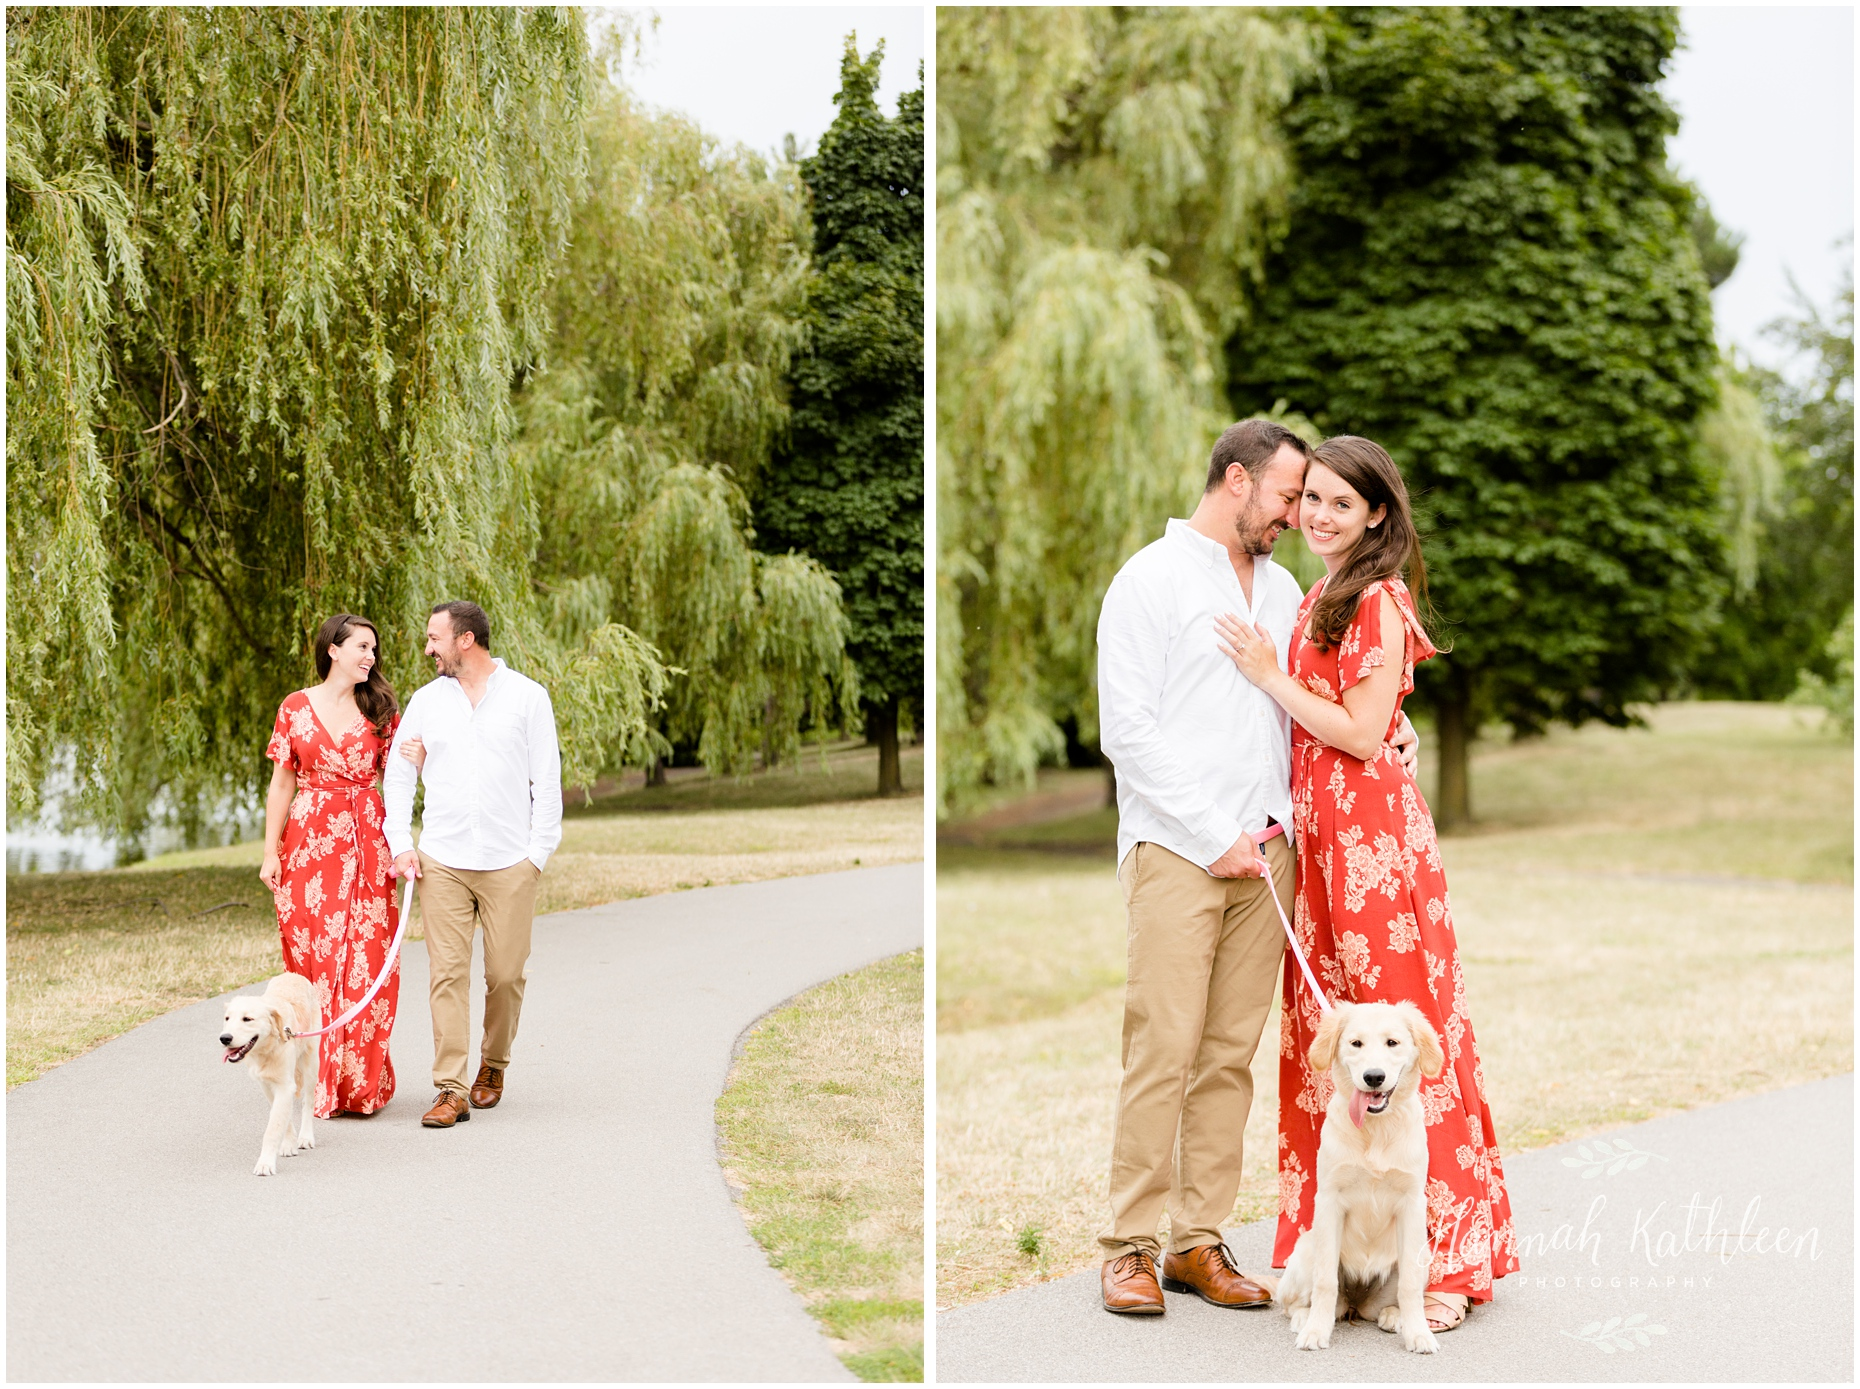 Jenna_Chris_Albright_Knox_WNY_Canalside_Engagement_Buffalo_NY_Photographer